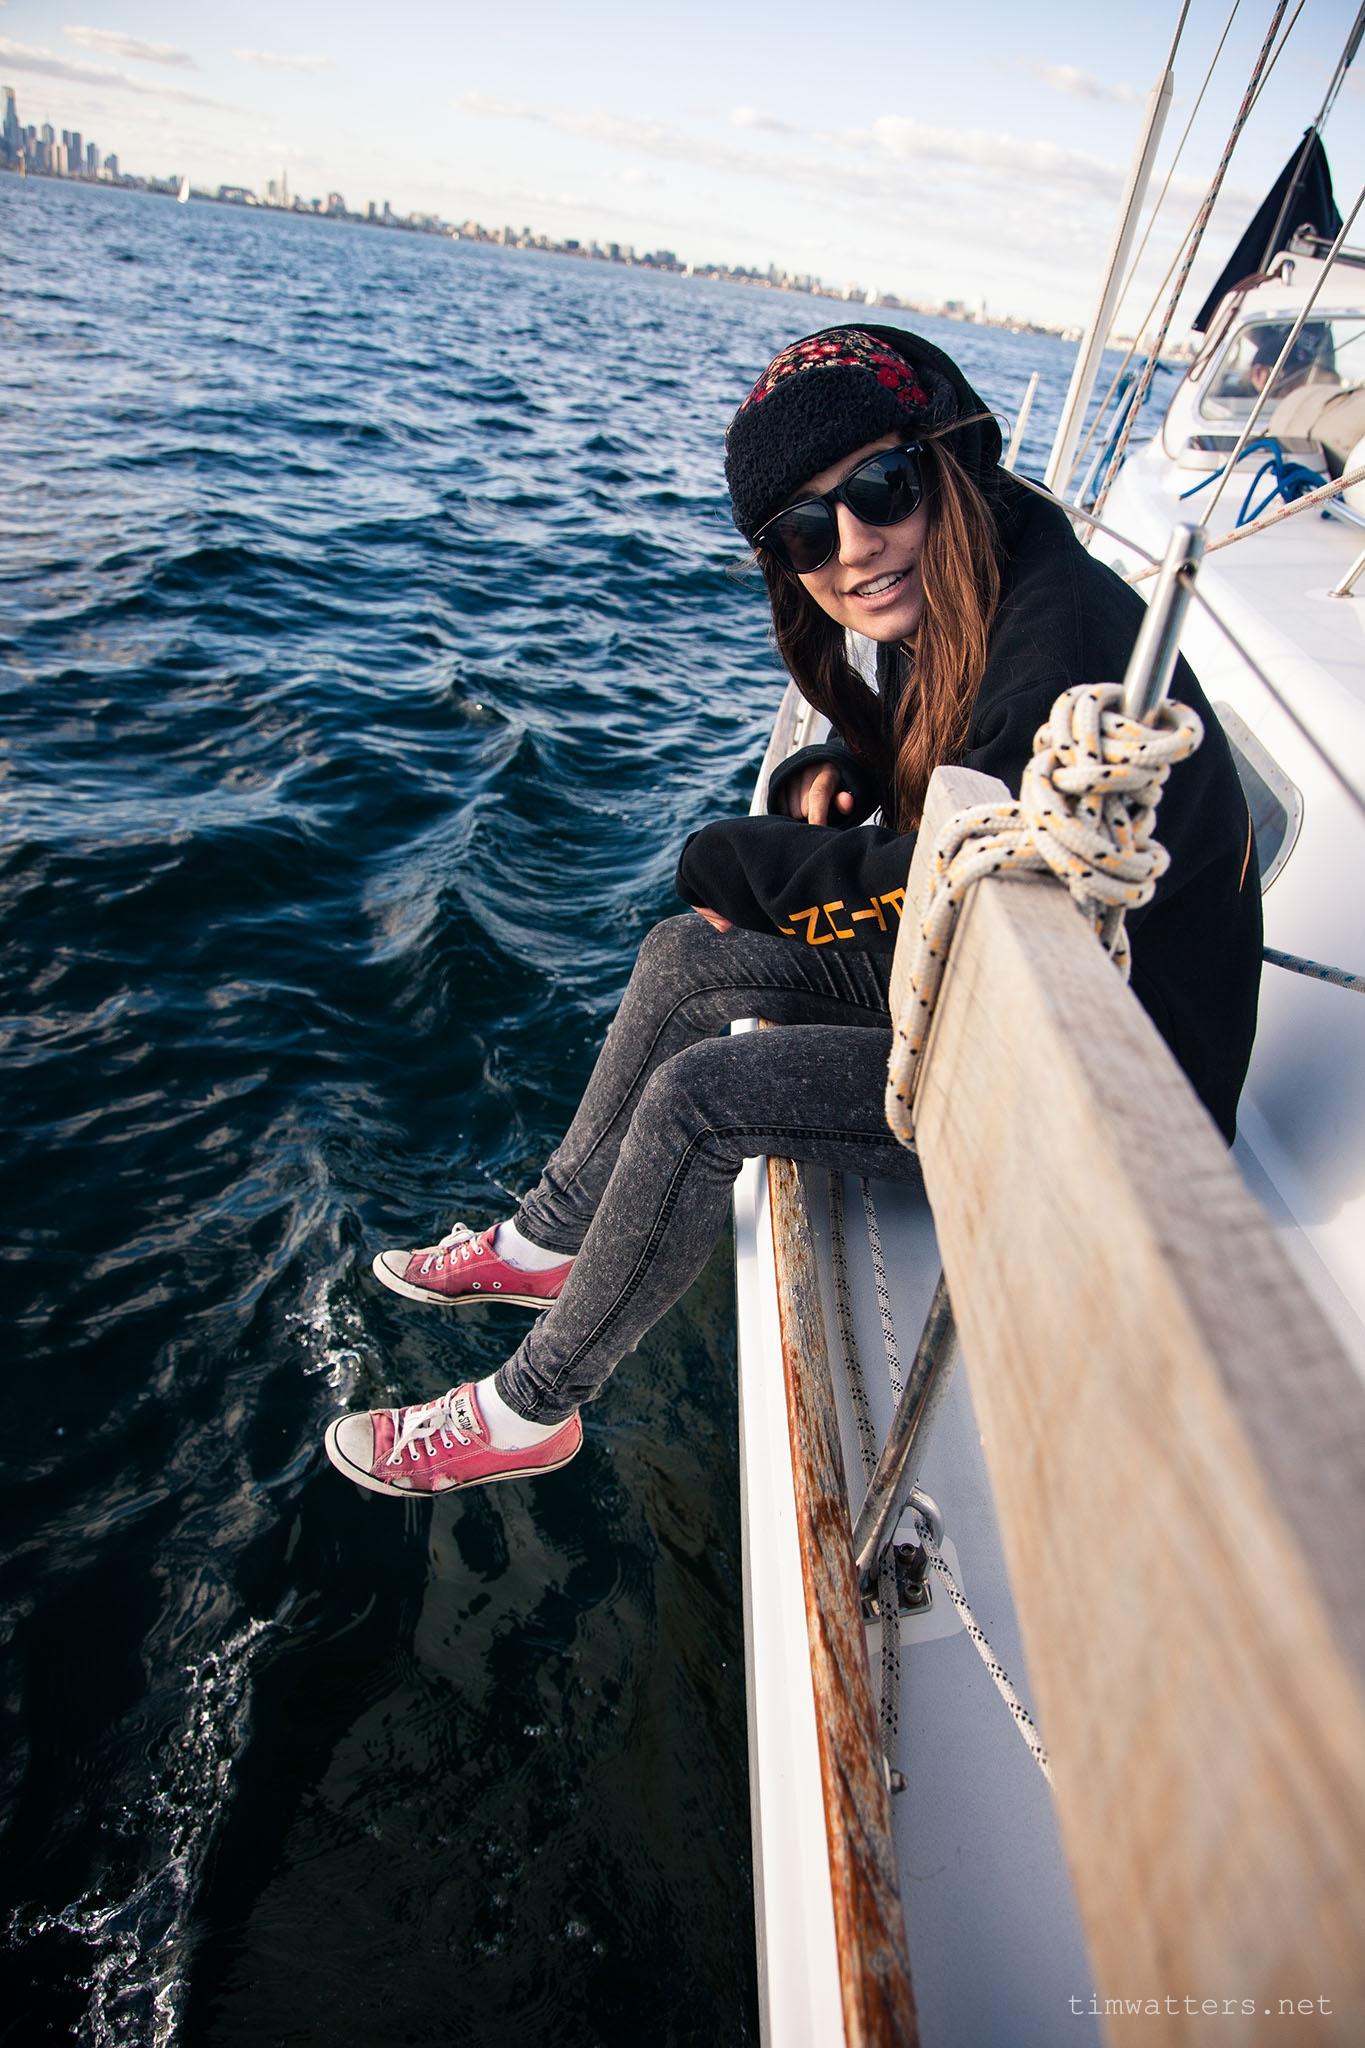 20130608_TJW_Sailing_12.jpg